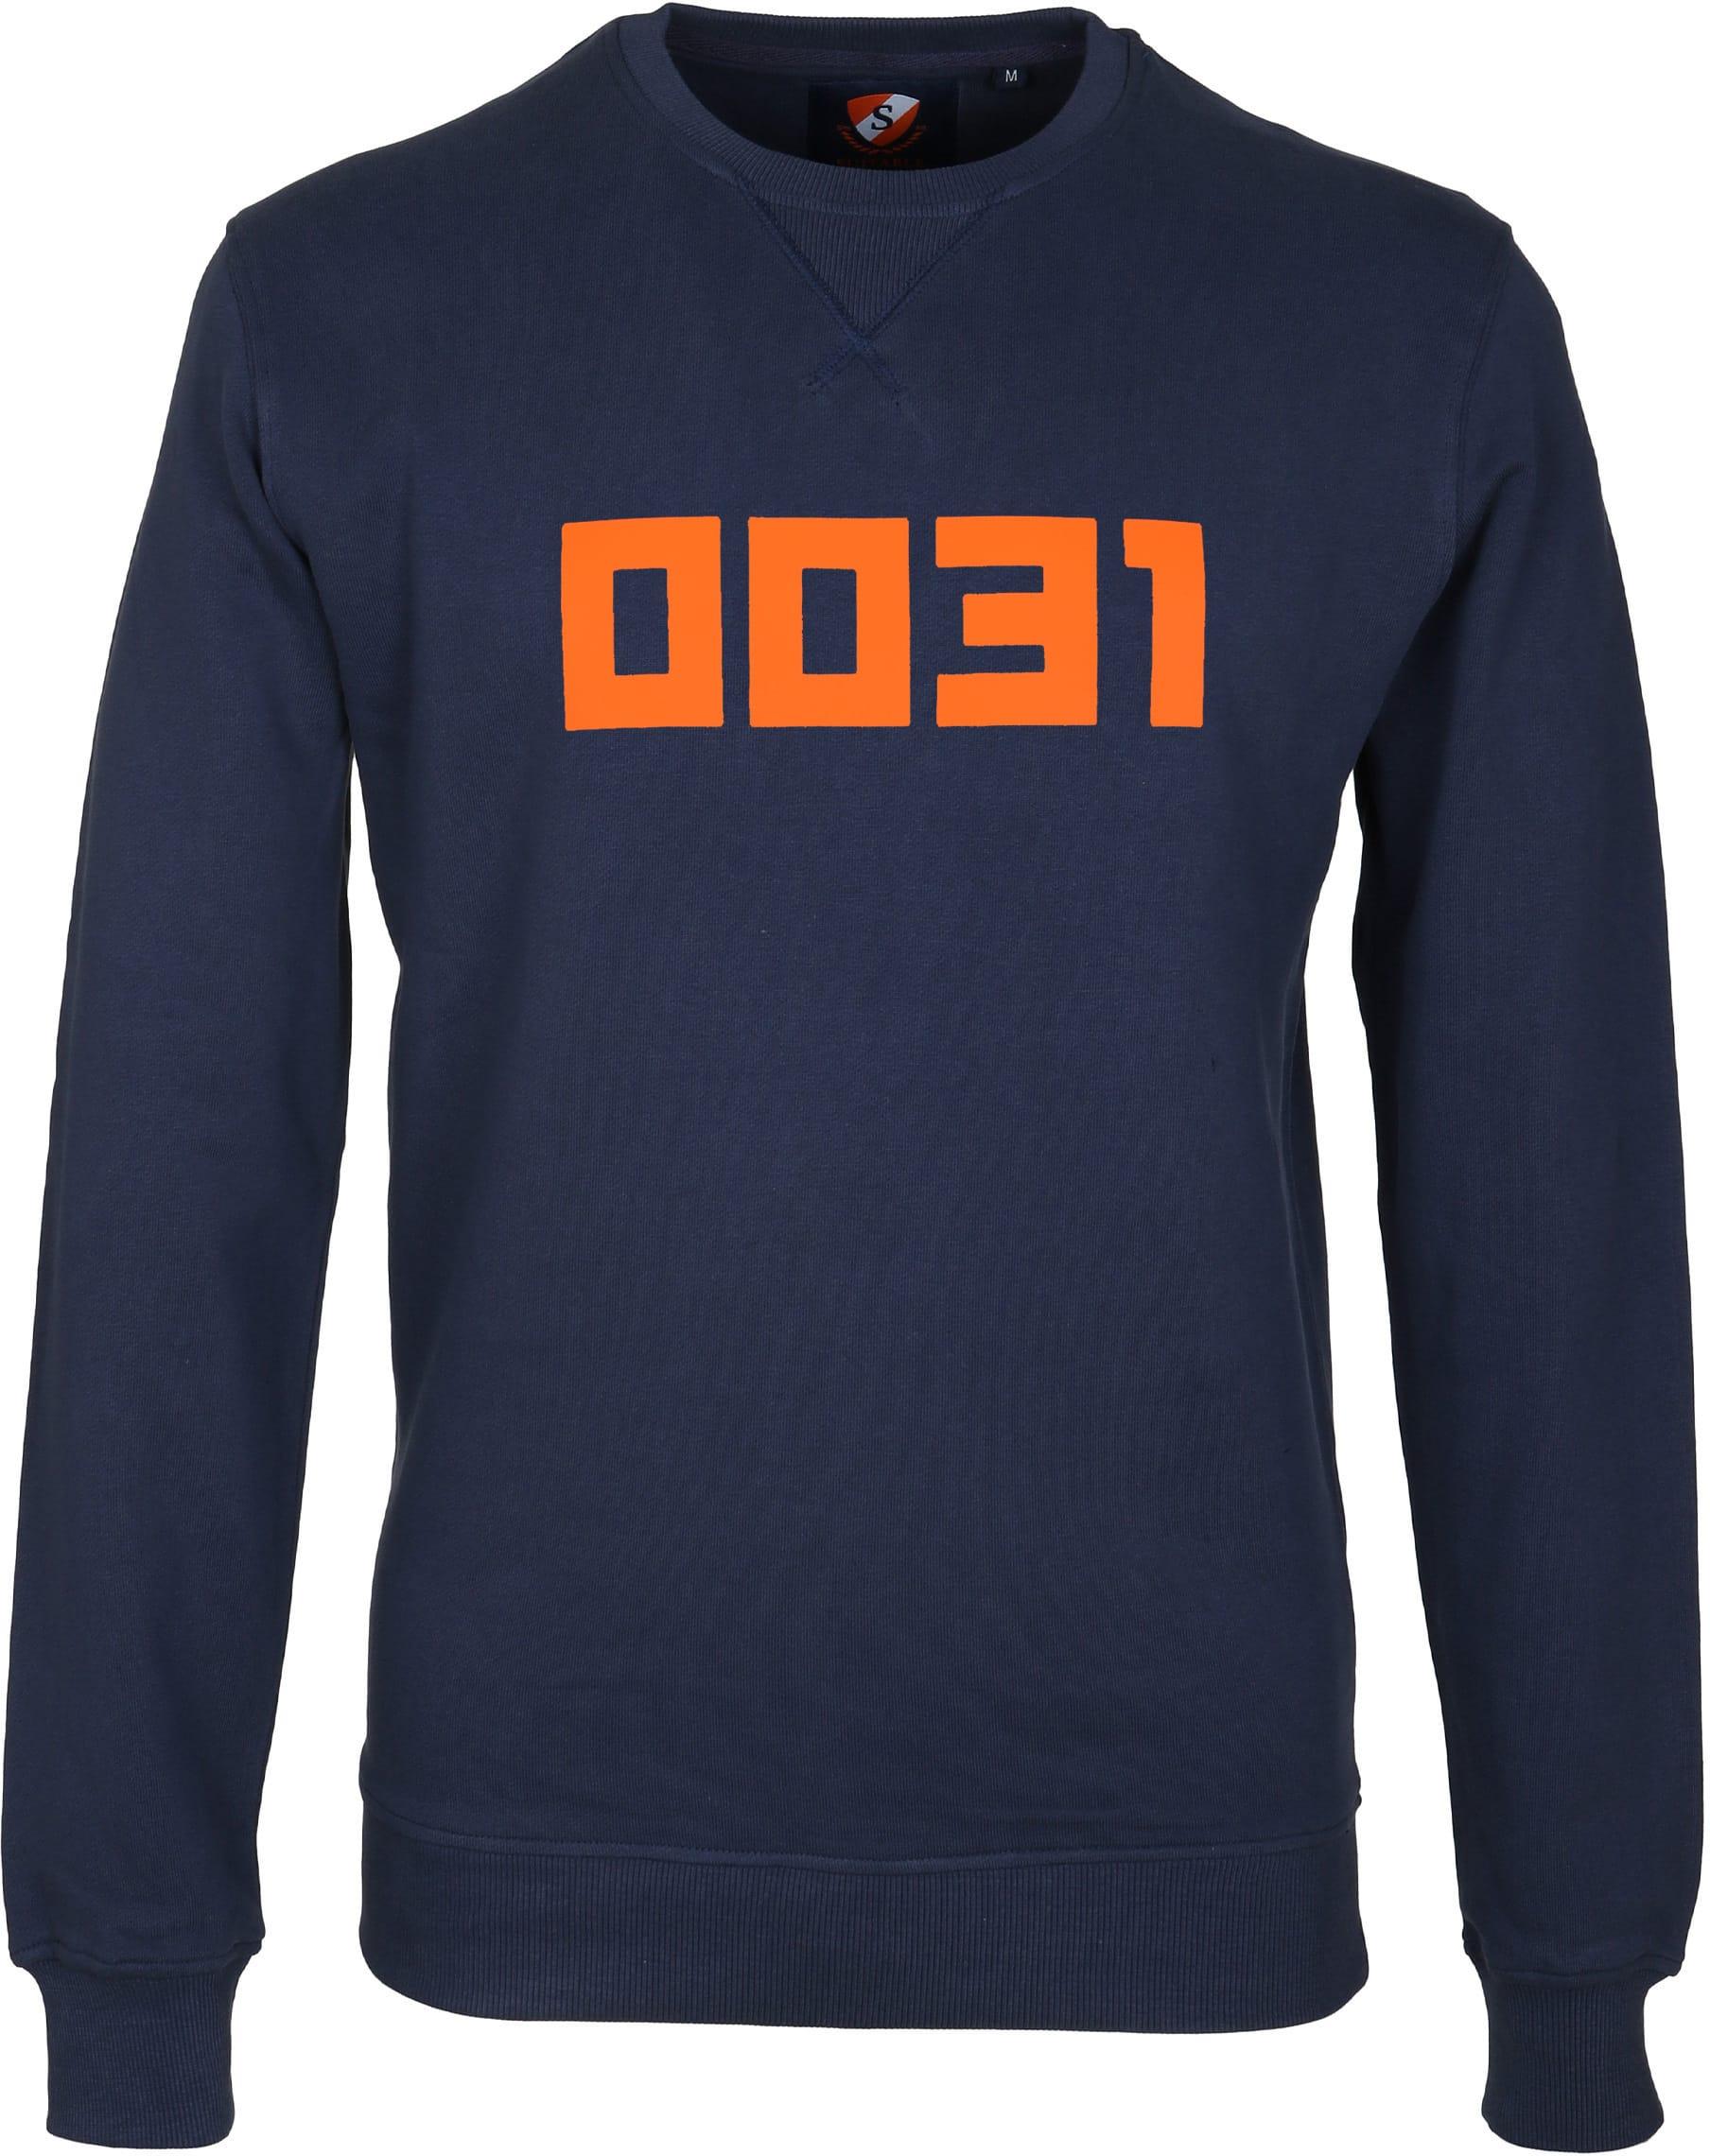 Suitable Sweater 0031 foto 0